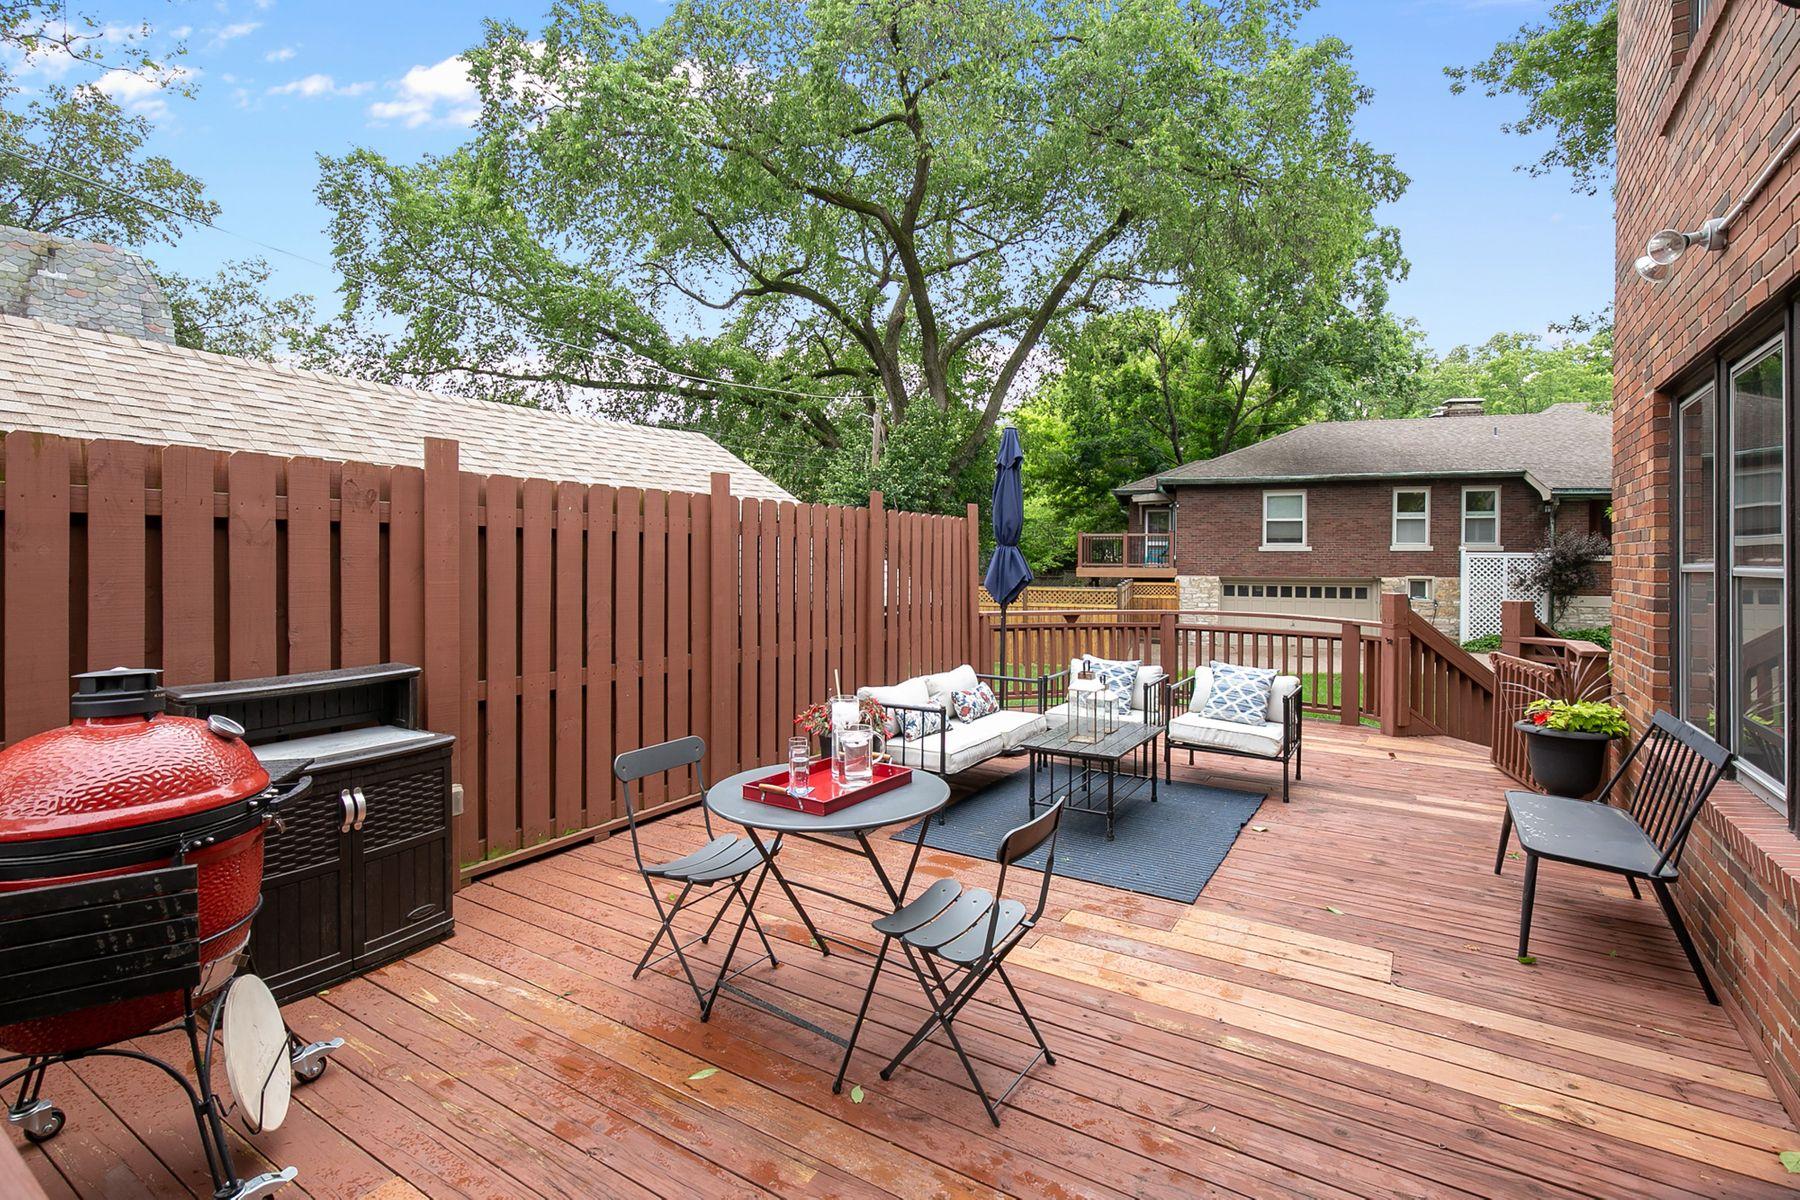 Additional photo for property listing at University City Charmer! 7434 Kingsbury Boulevard University City, Missouri 63130 United States